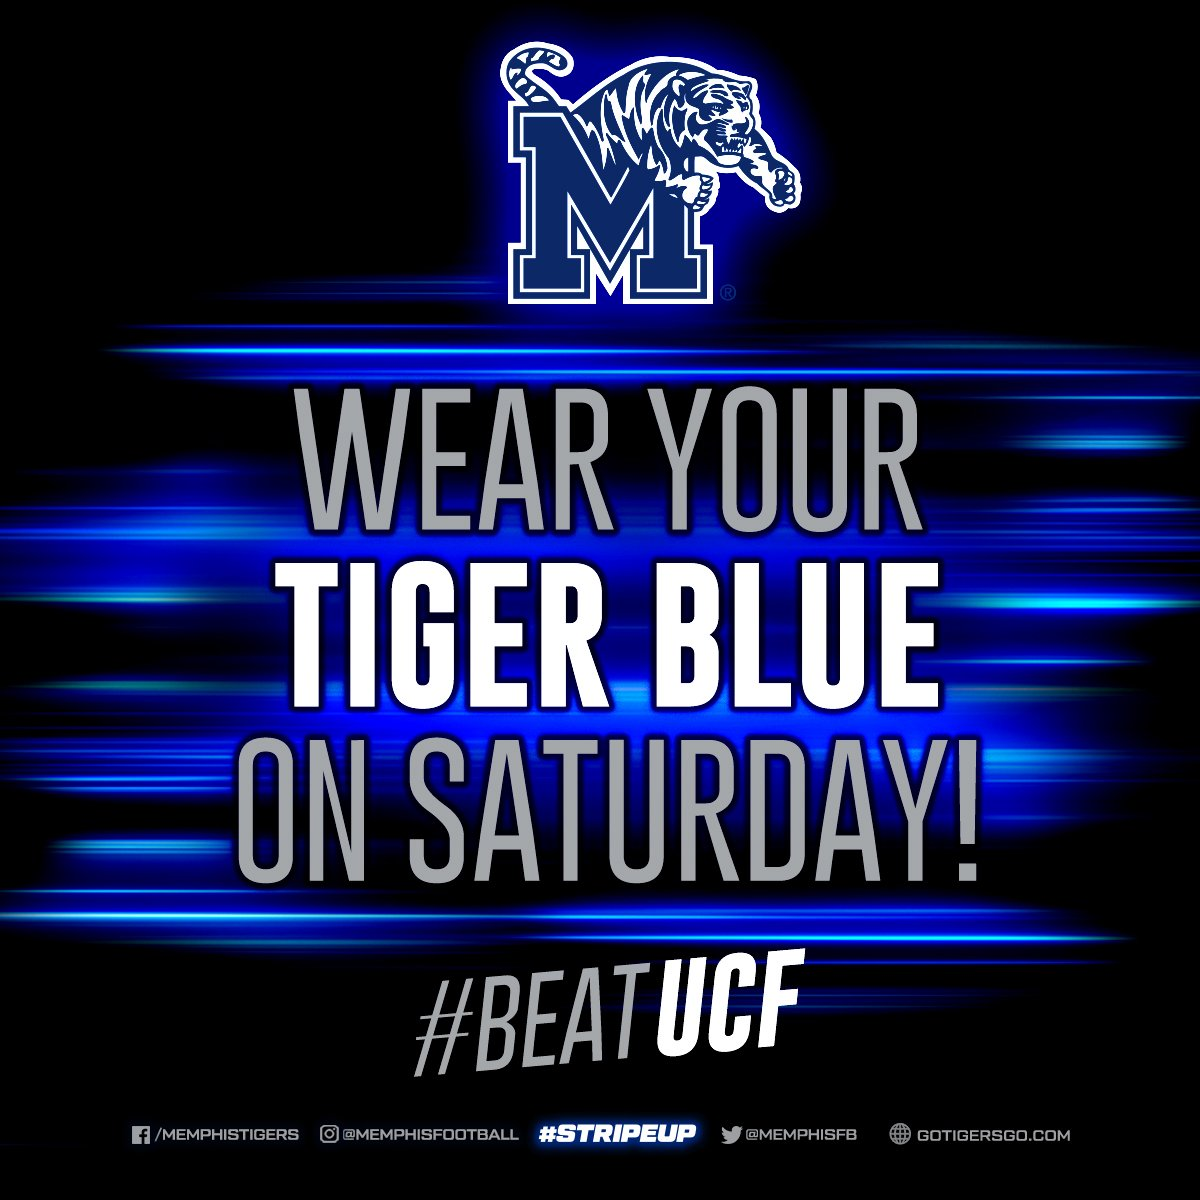 9️⃣0️⃣1️⃣ we are calling for a #BlueOut for the football game on Saturday!  Tickets ➡️ http://gotigersgotix.com  #BeatUCF #GoTigersGo #StripeUp #BlueOut